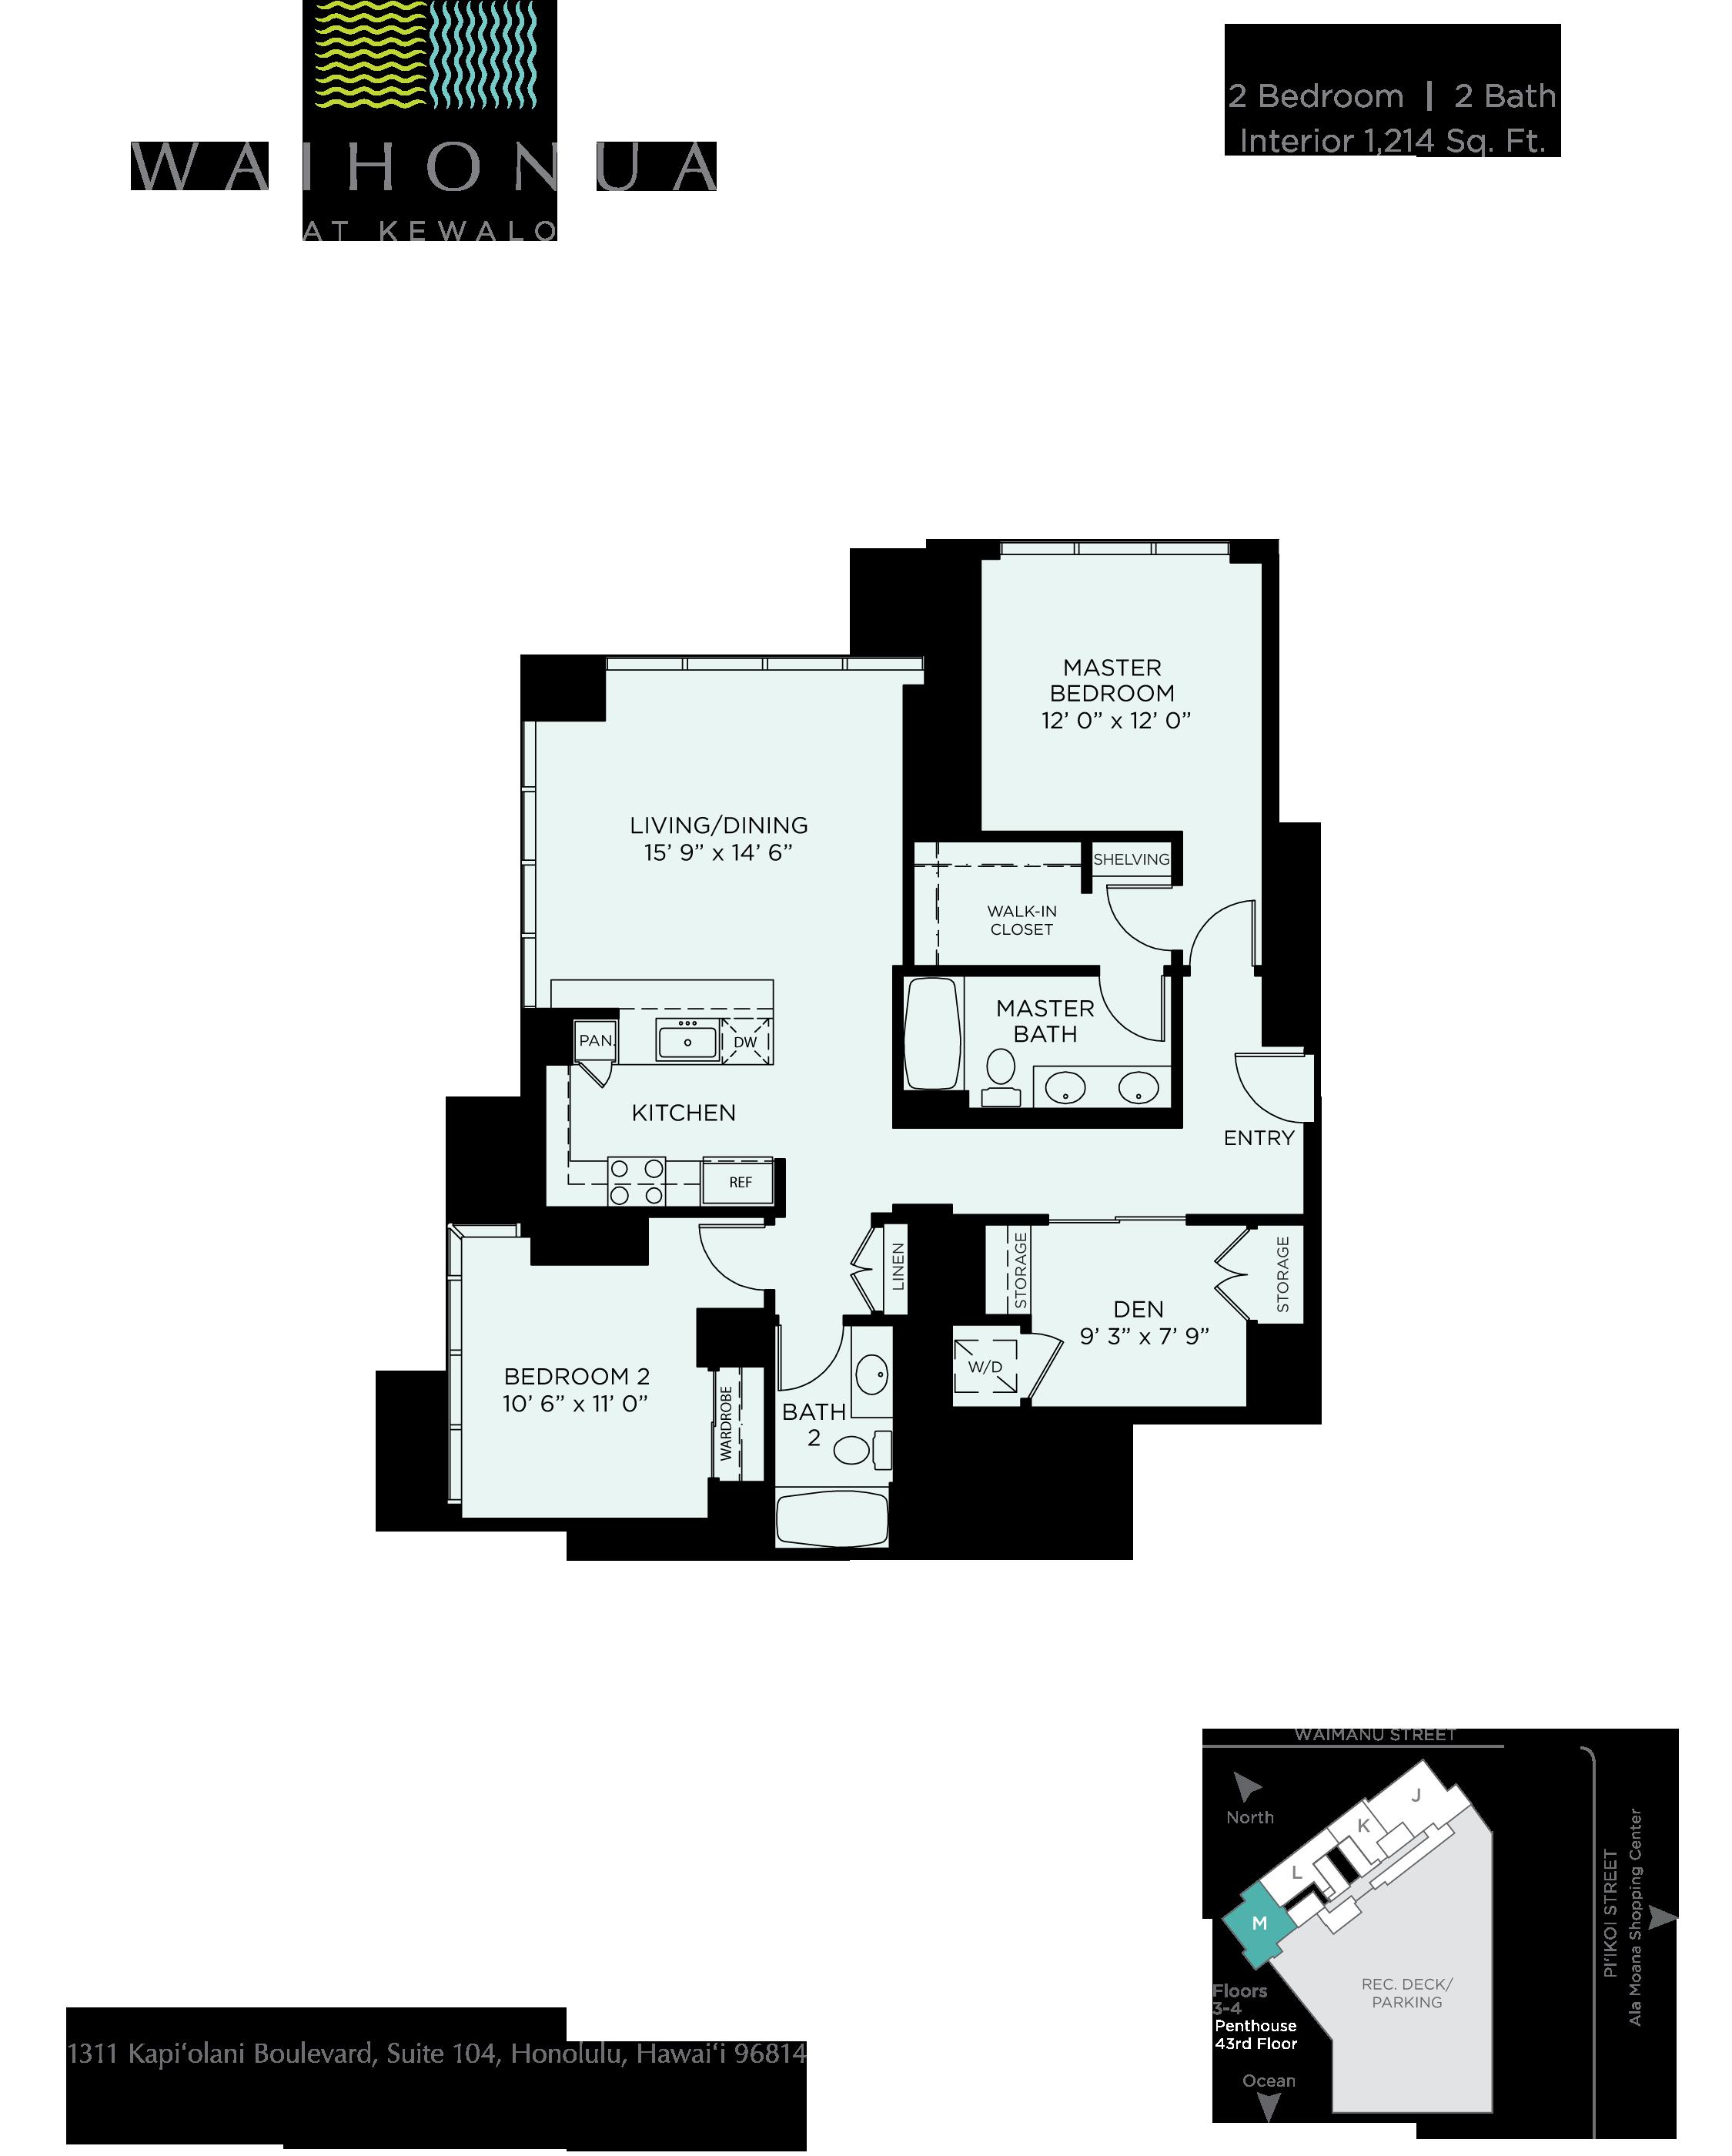 Waihonua Floor Plan M